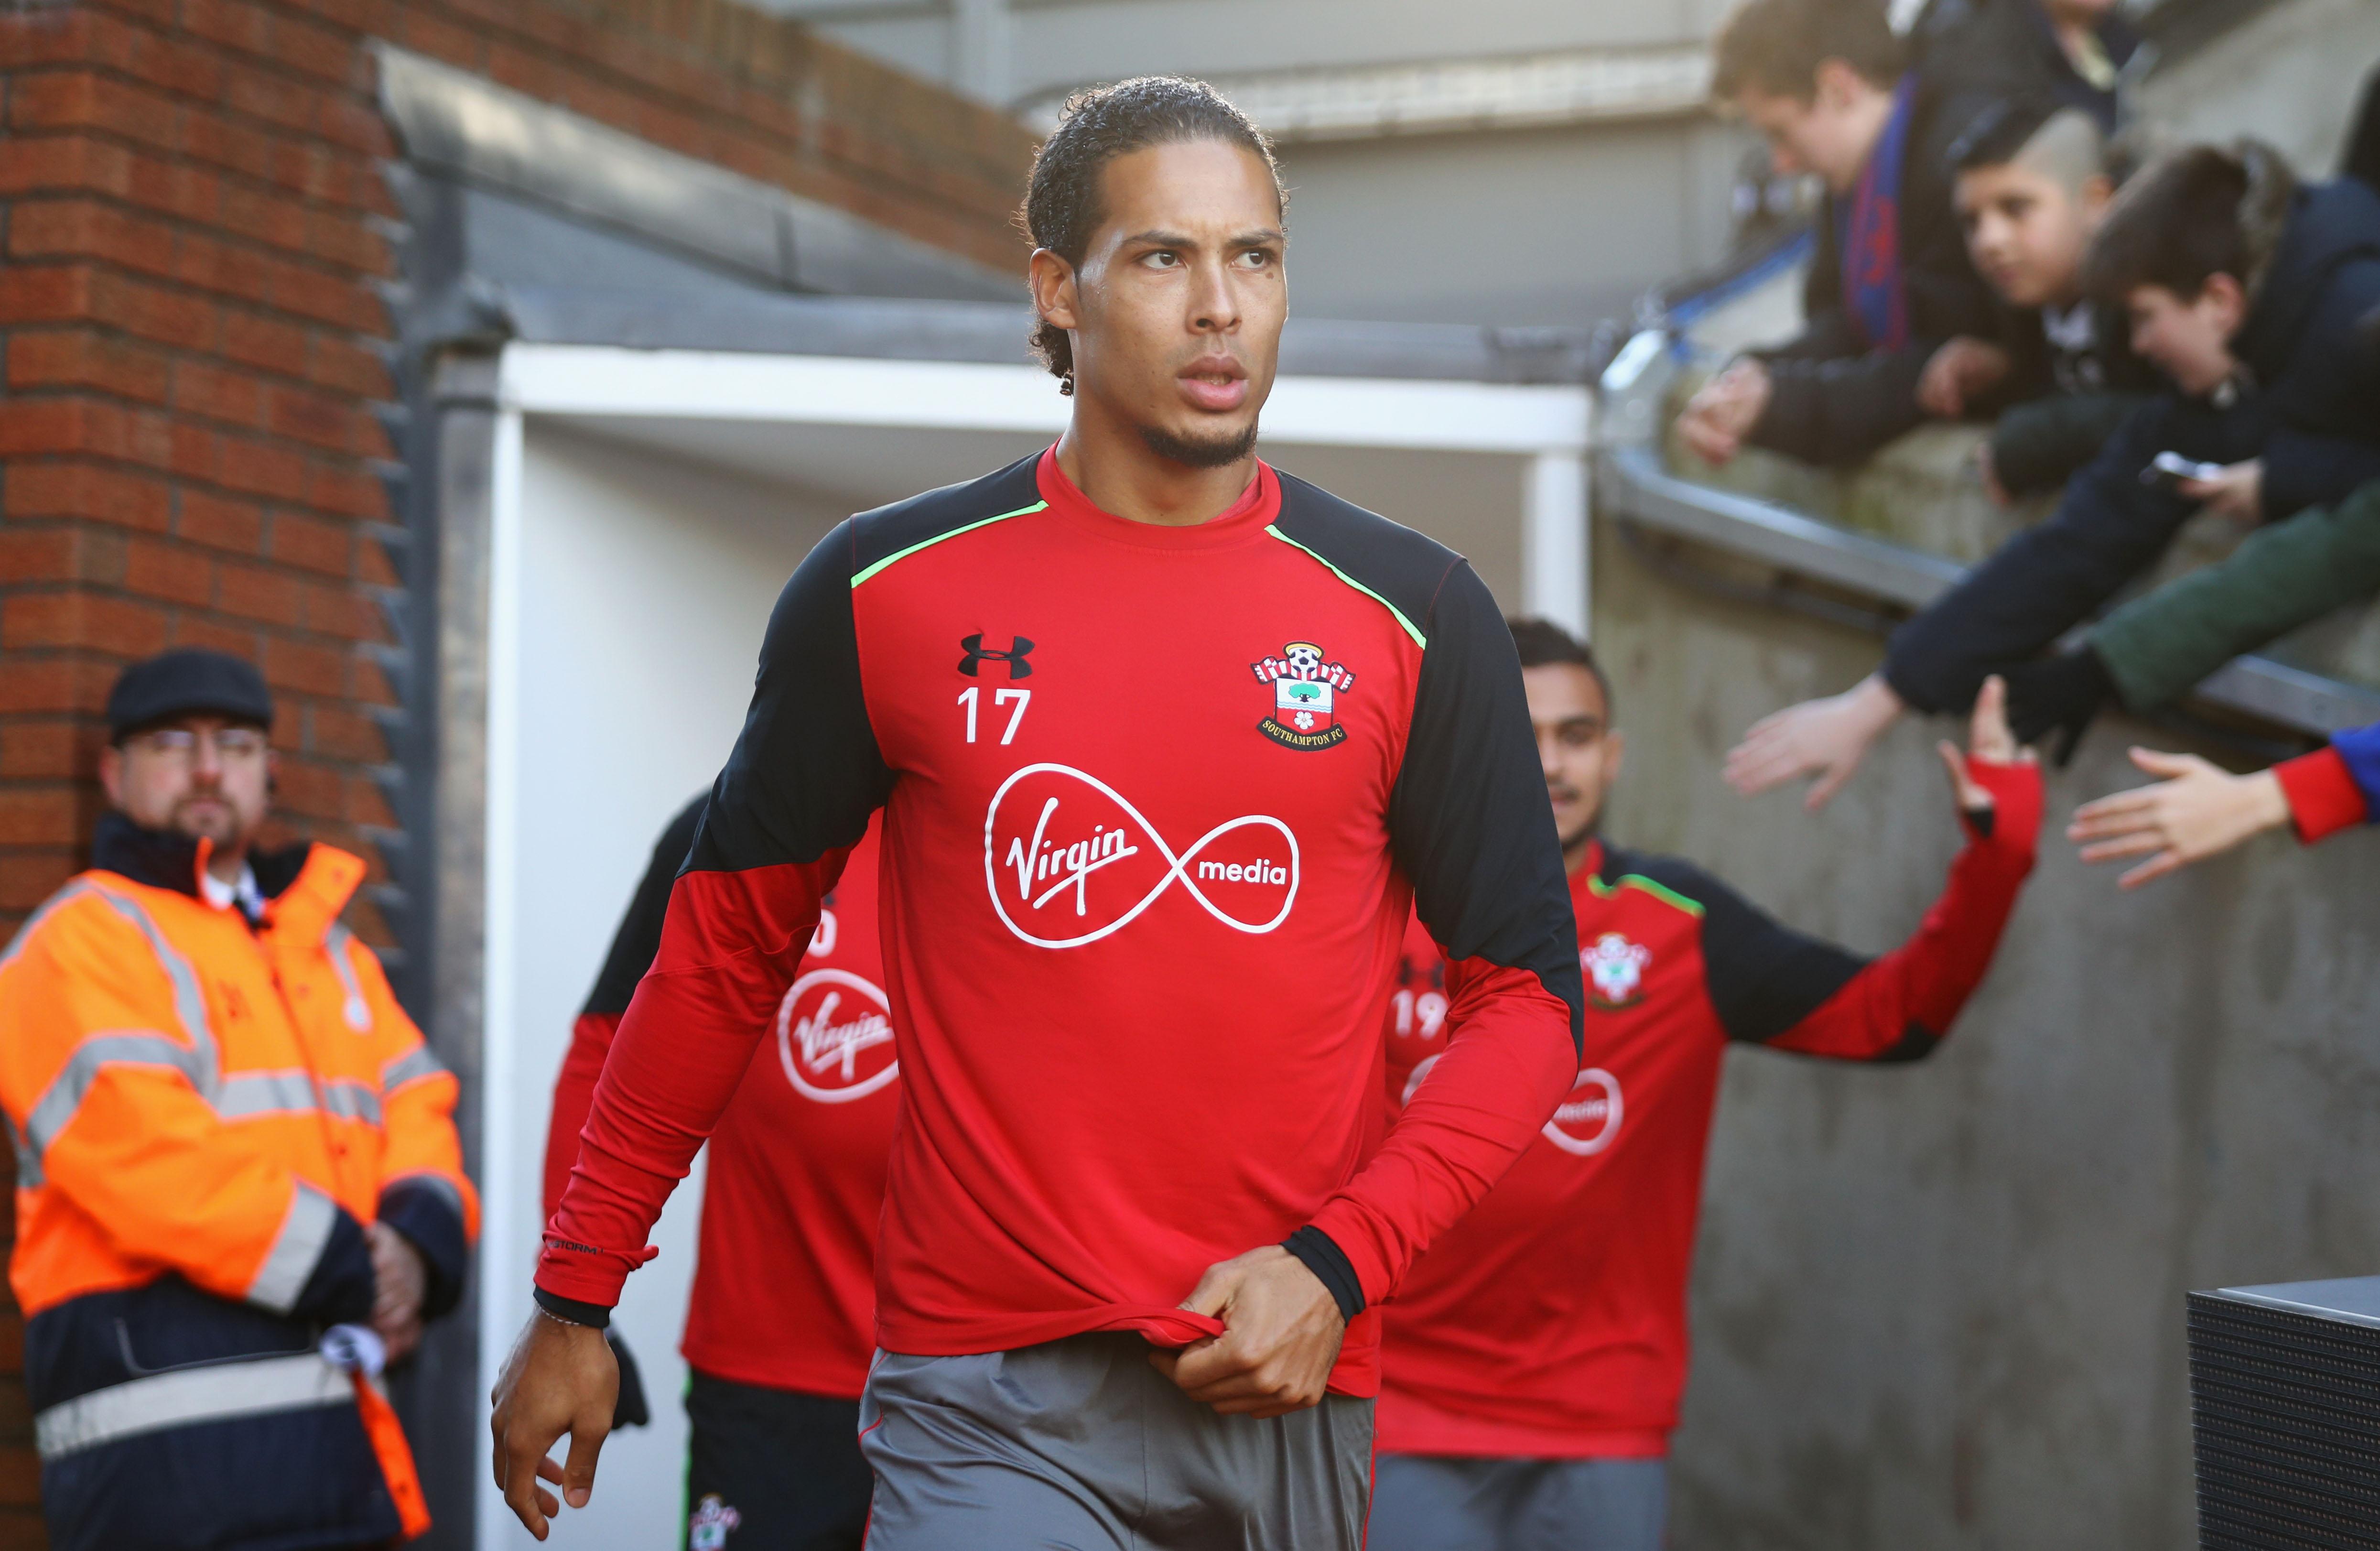 Chelsea join Manchester United in race to sign Virgil van Dijk